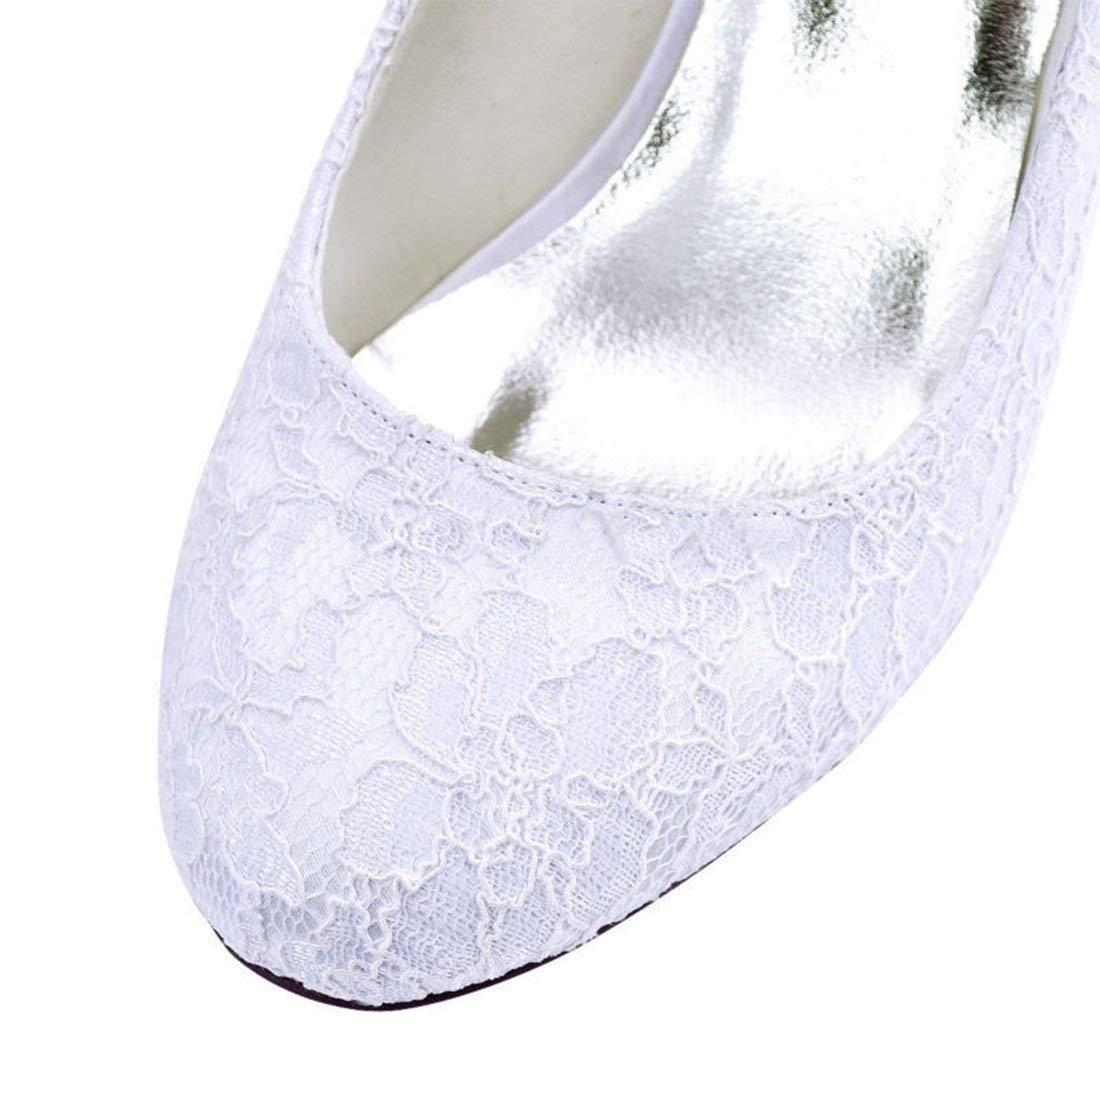 ZHRUI Damen-Doppeltes Bügel-Med-Ferse-weiße Spitze-Hochzeits-Formale Spitze-Hochzeits-Formale Spitze-Hochzeits-Formale Schuhe Großbritannien 5 (Farbe   -, Größe   -) 6be14a